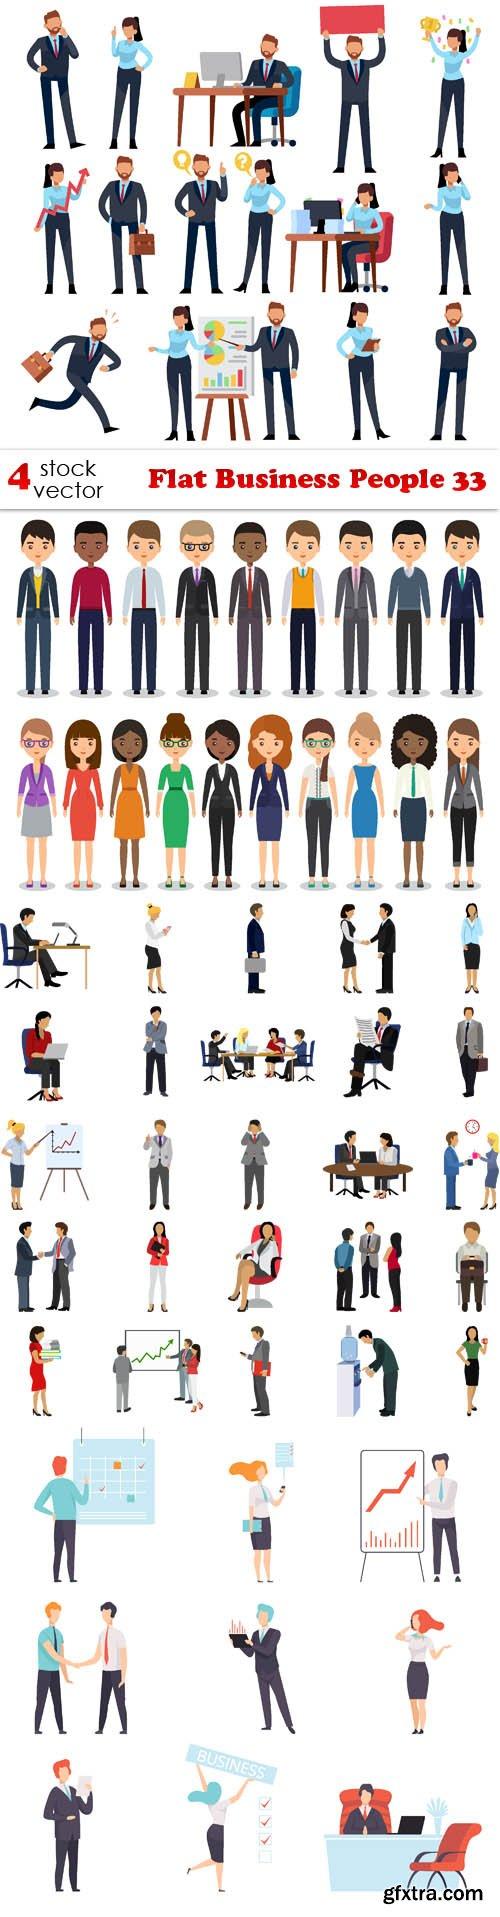 Vectors - Flat Business People 33